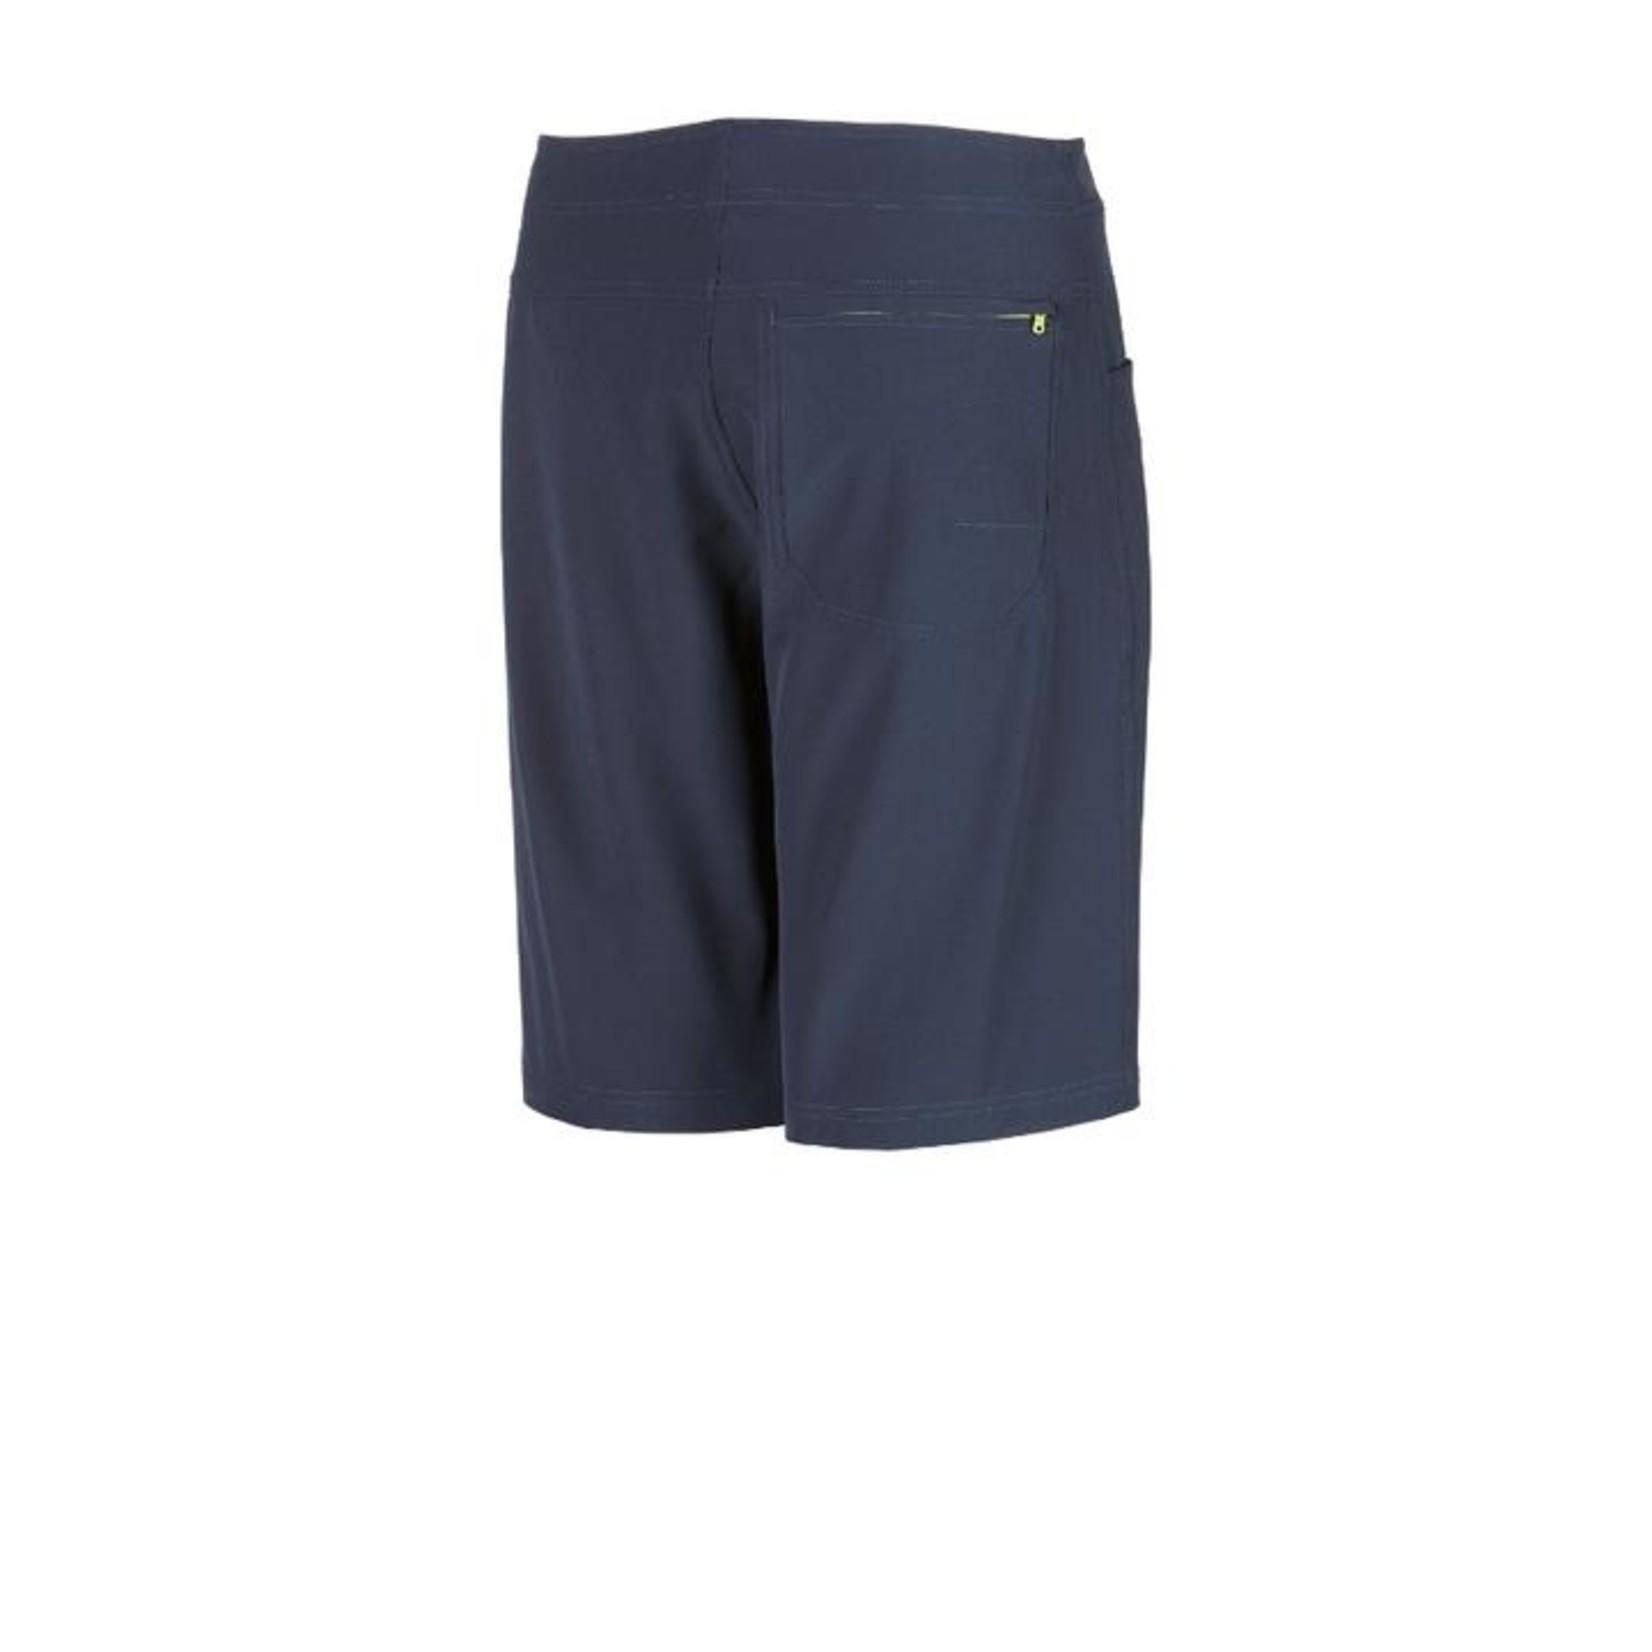 Immersion Research Men's Penstock Shorts